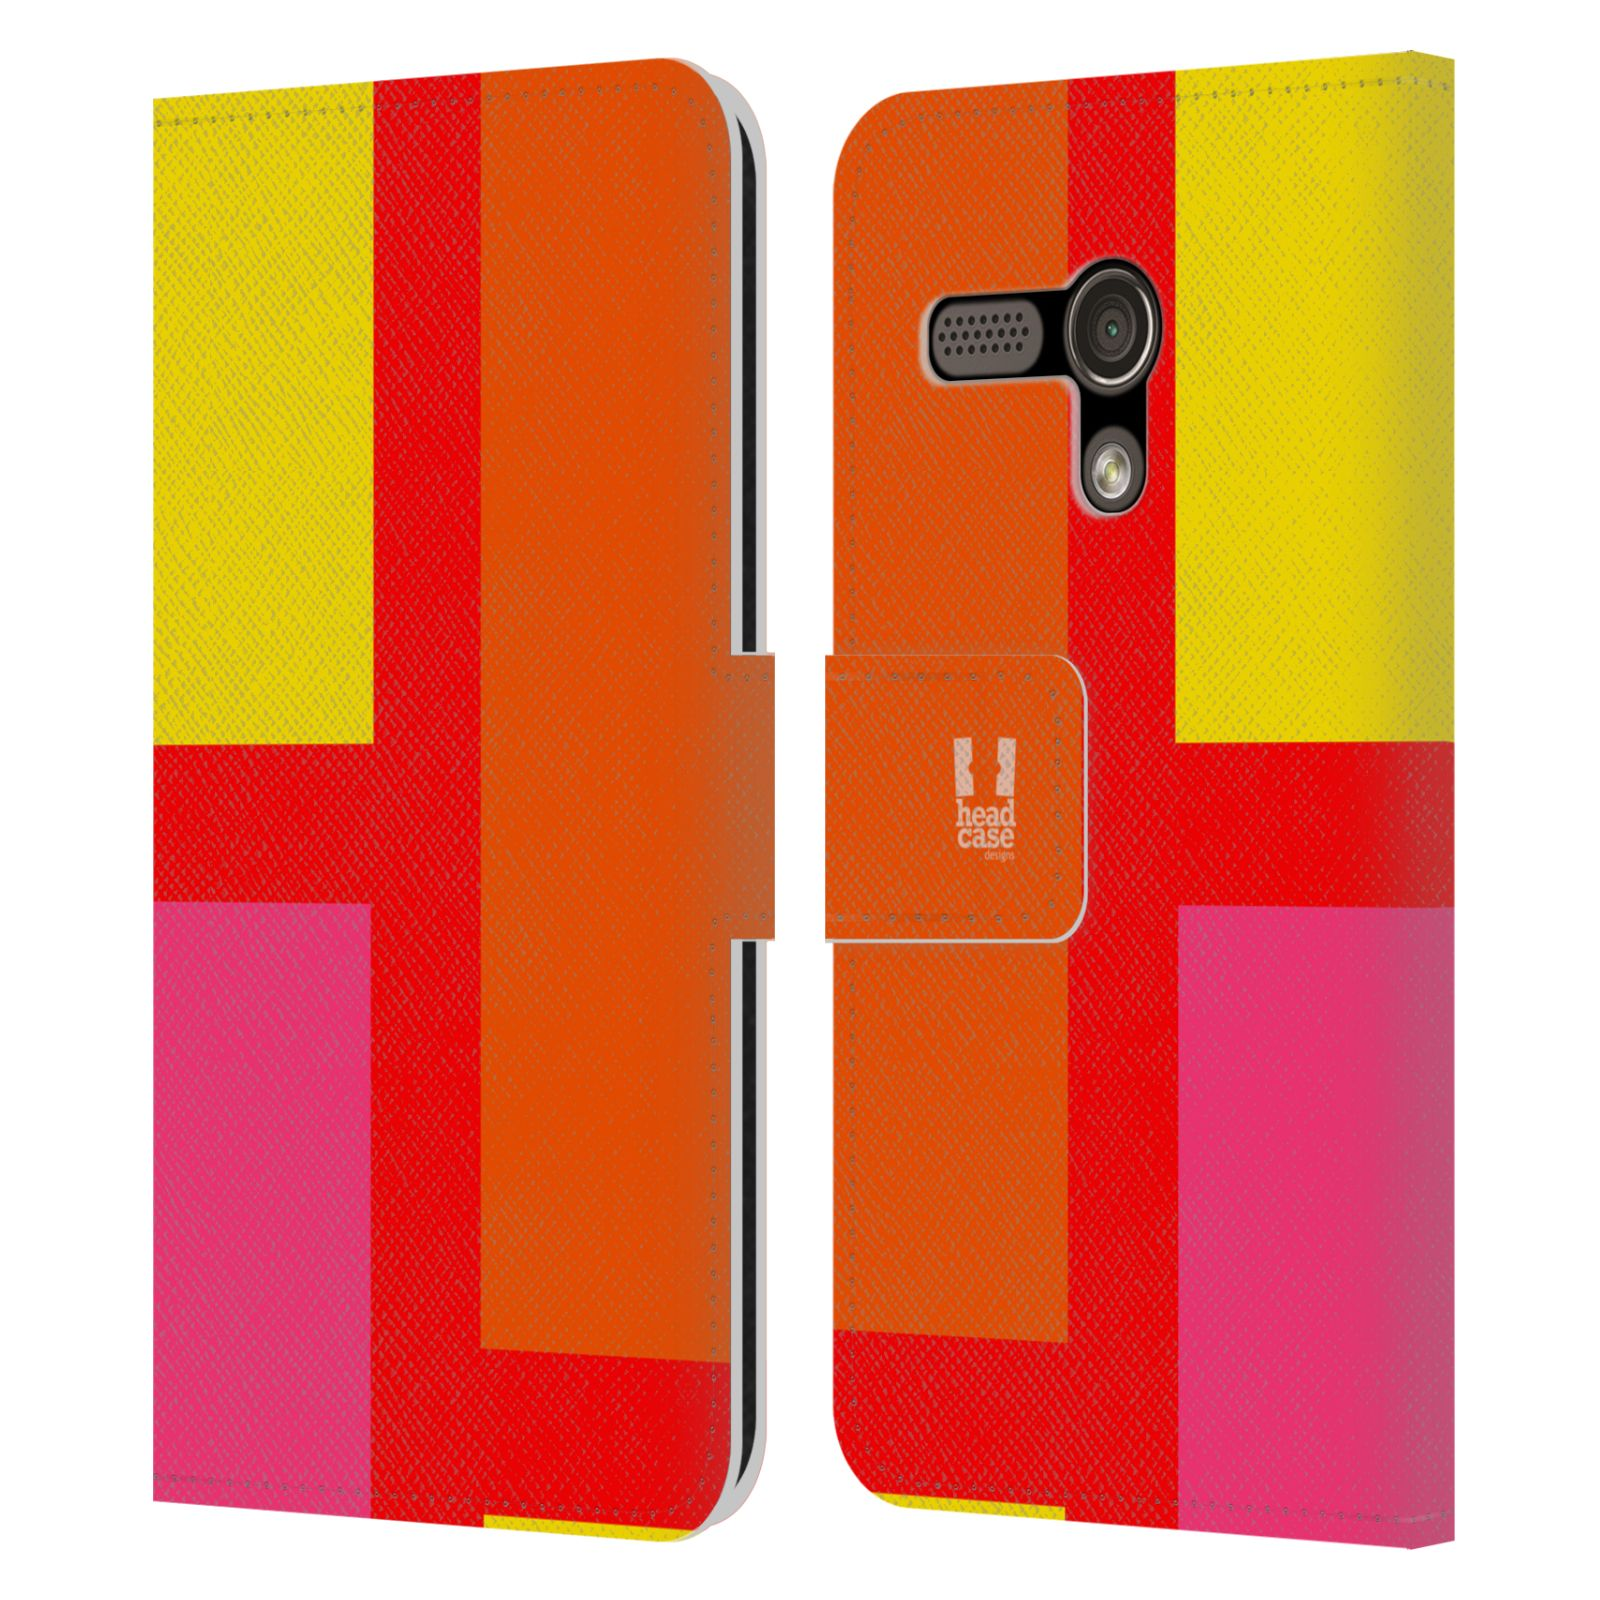 HEAD CASE Flipové pouzdro pro mobil Motorola MOTO G barevné tvary oranžová ulice